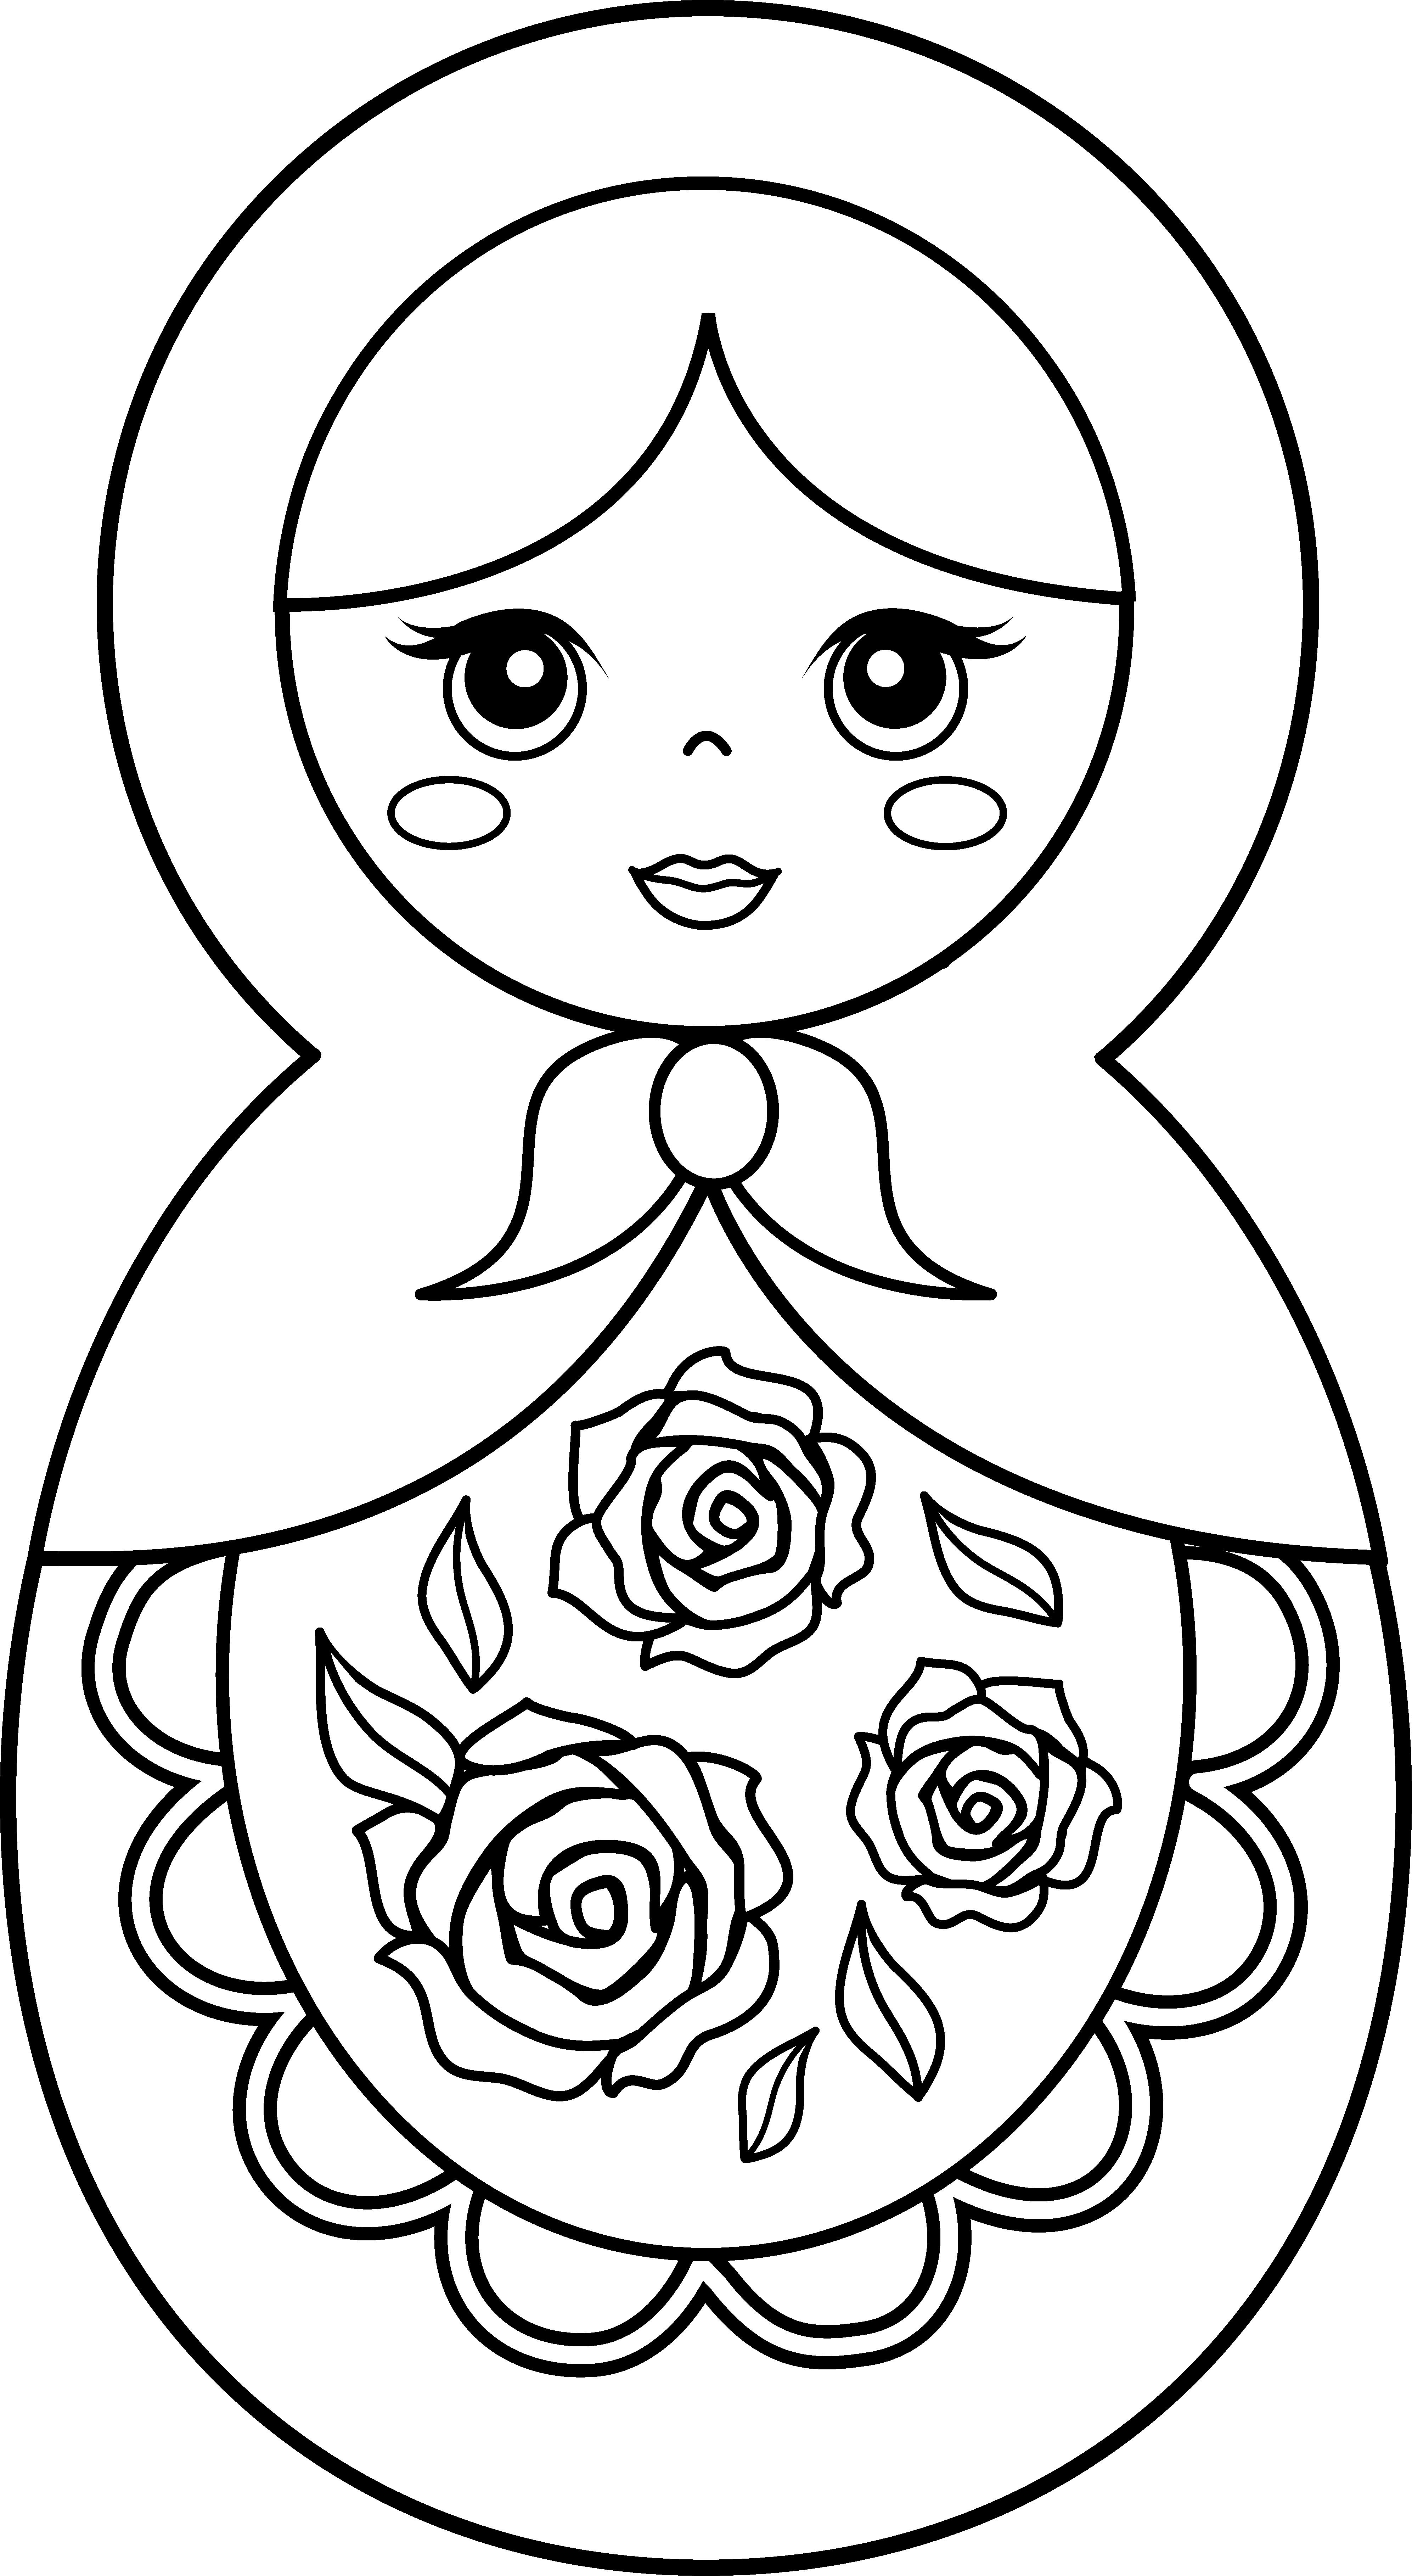 Doll clipart clip art baby. Matryoshka coloring page free